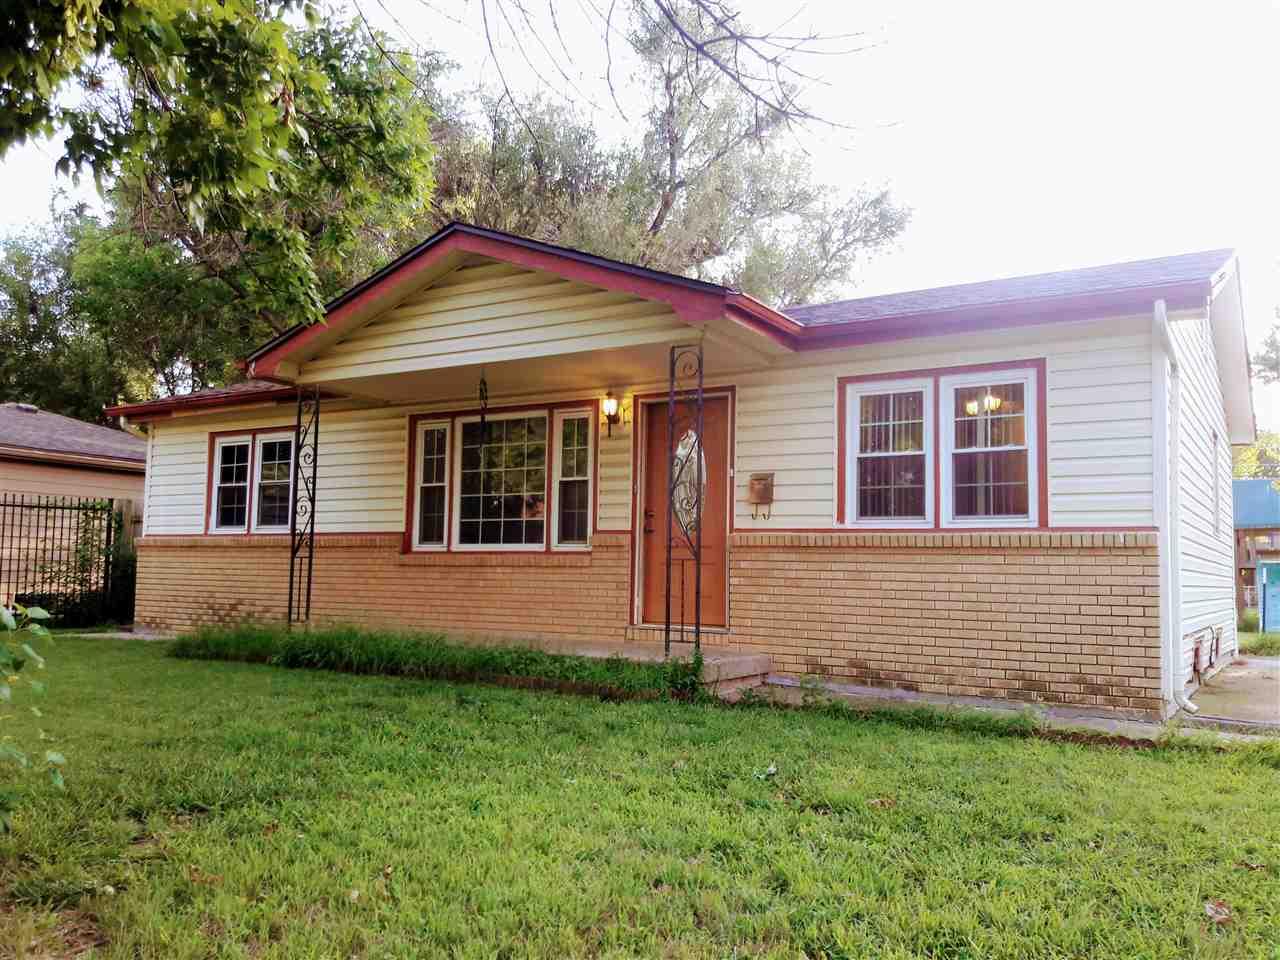 2621 S Elizabeth, Wichita, KS 67217